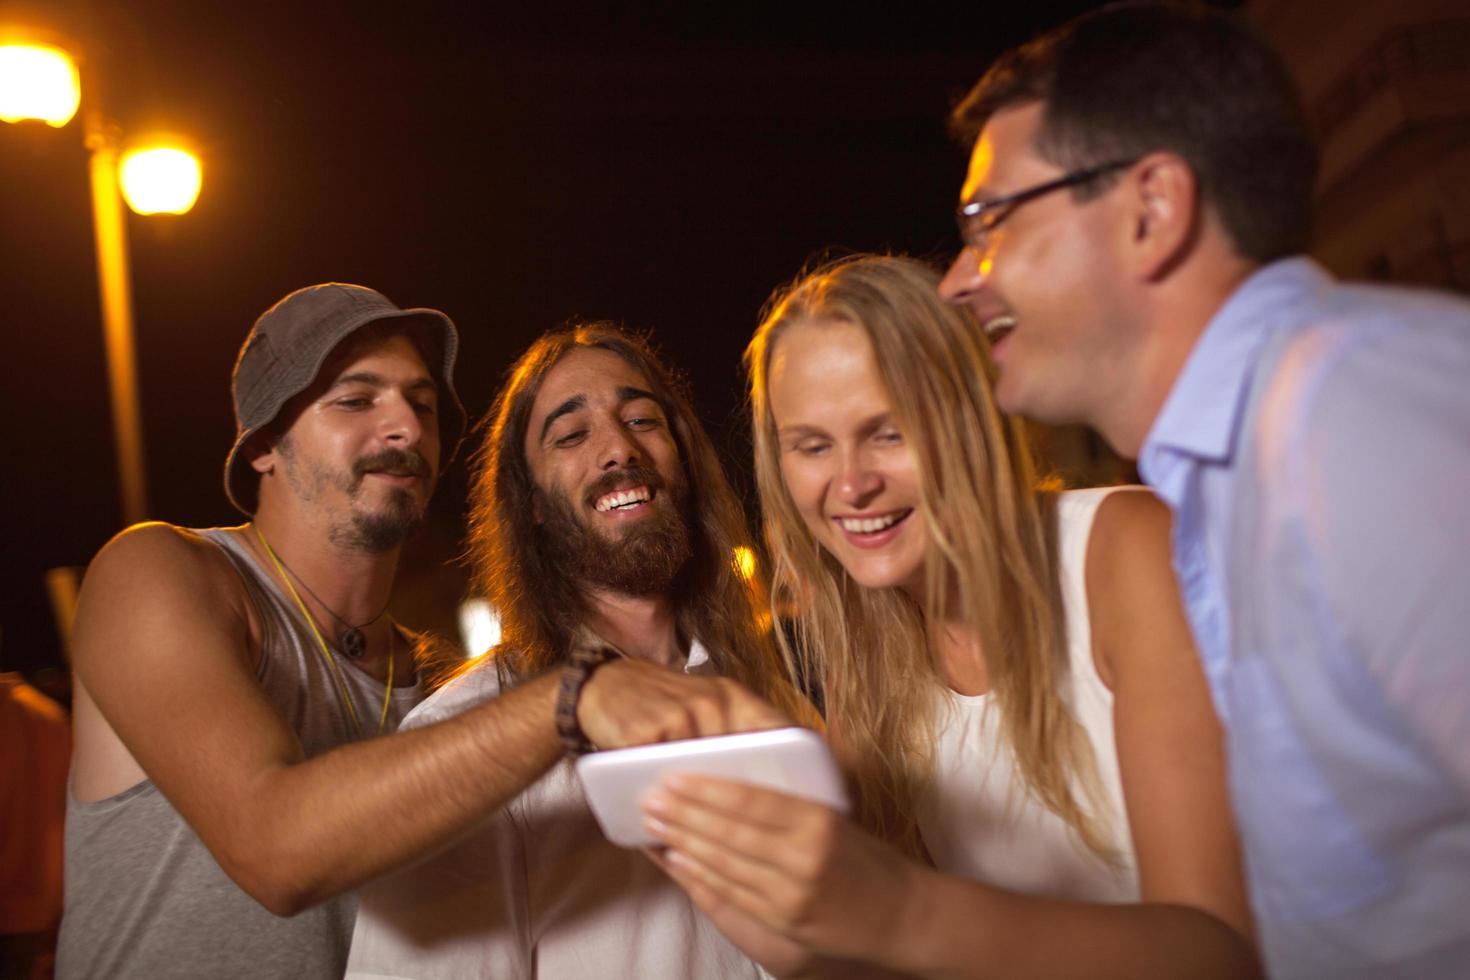 Friends having fun looking at a phone photo